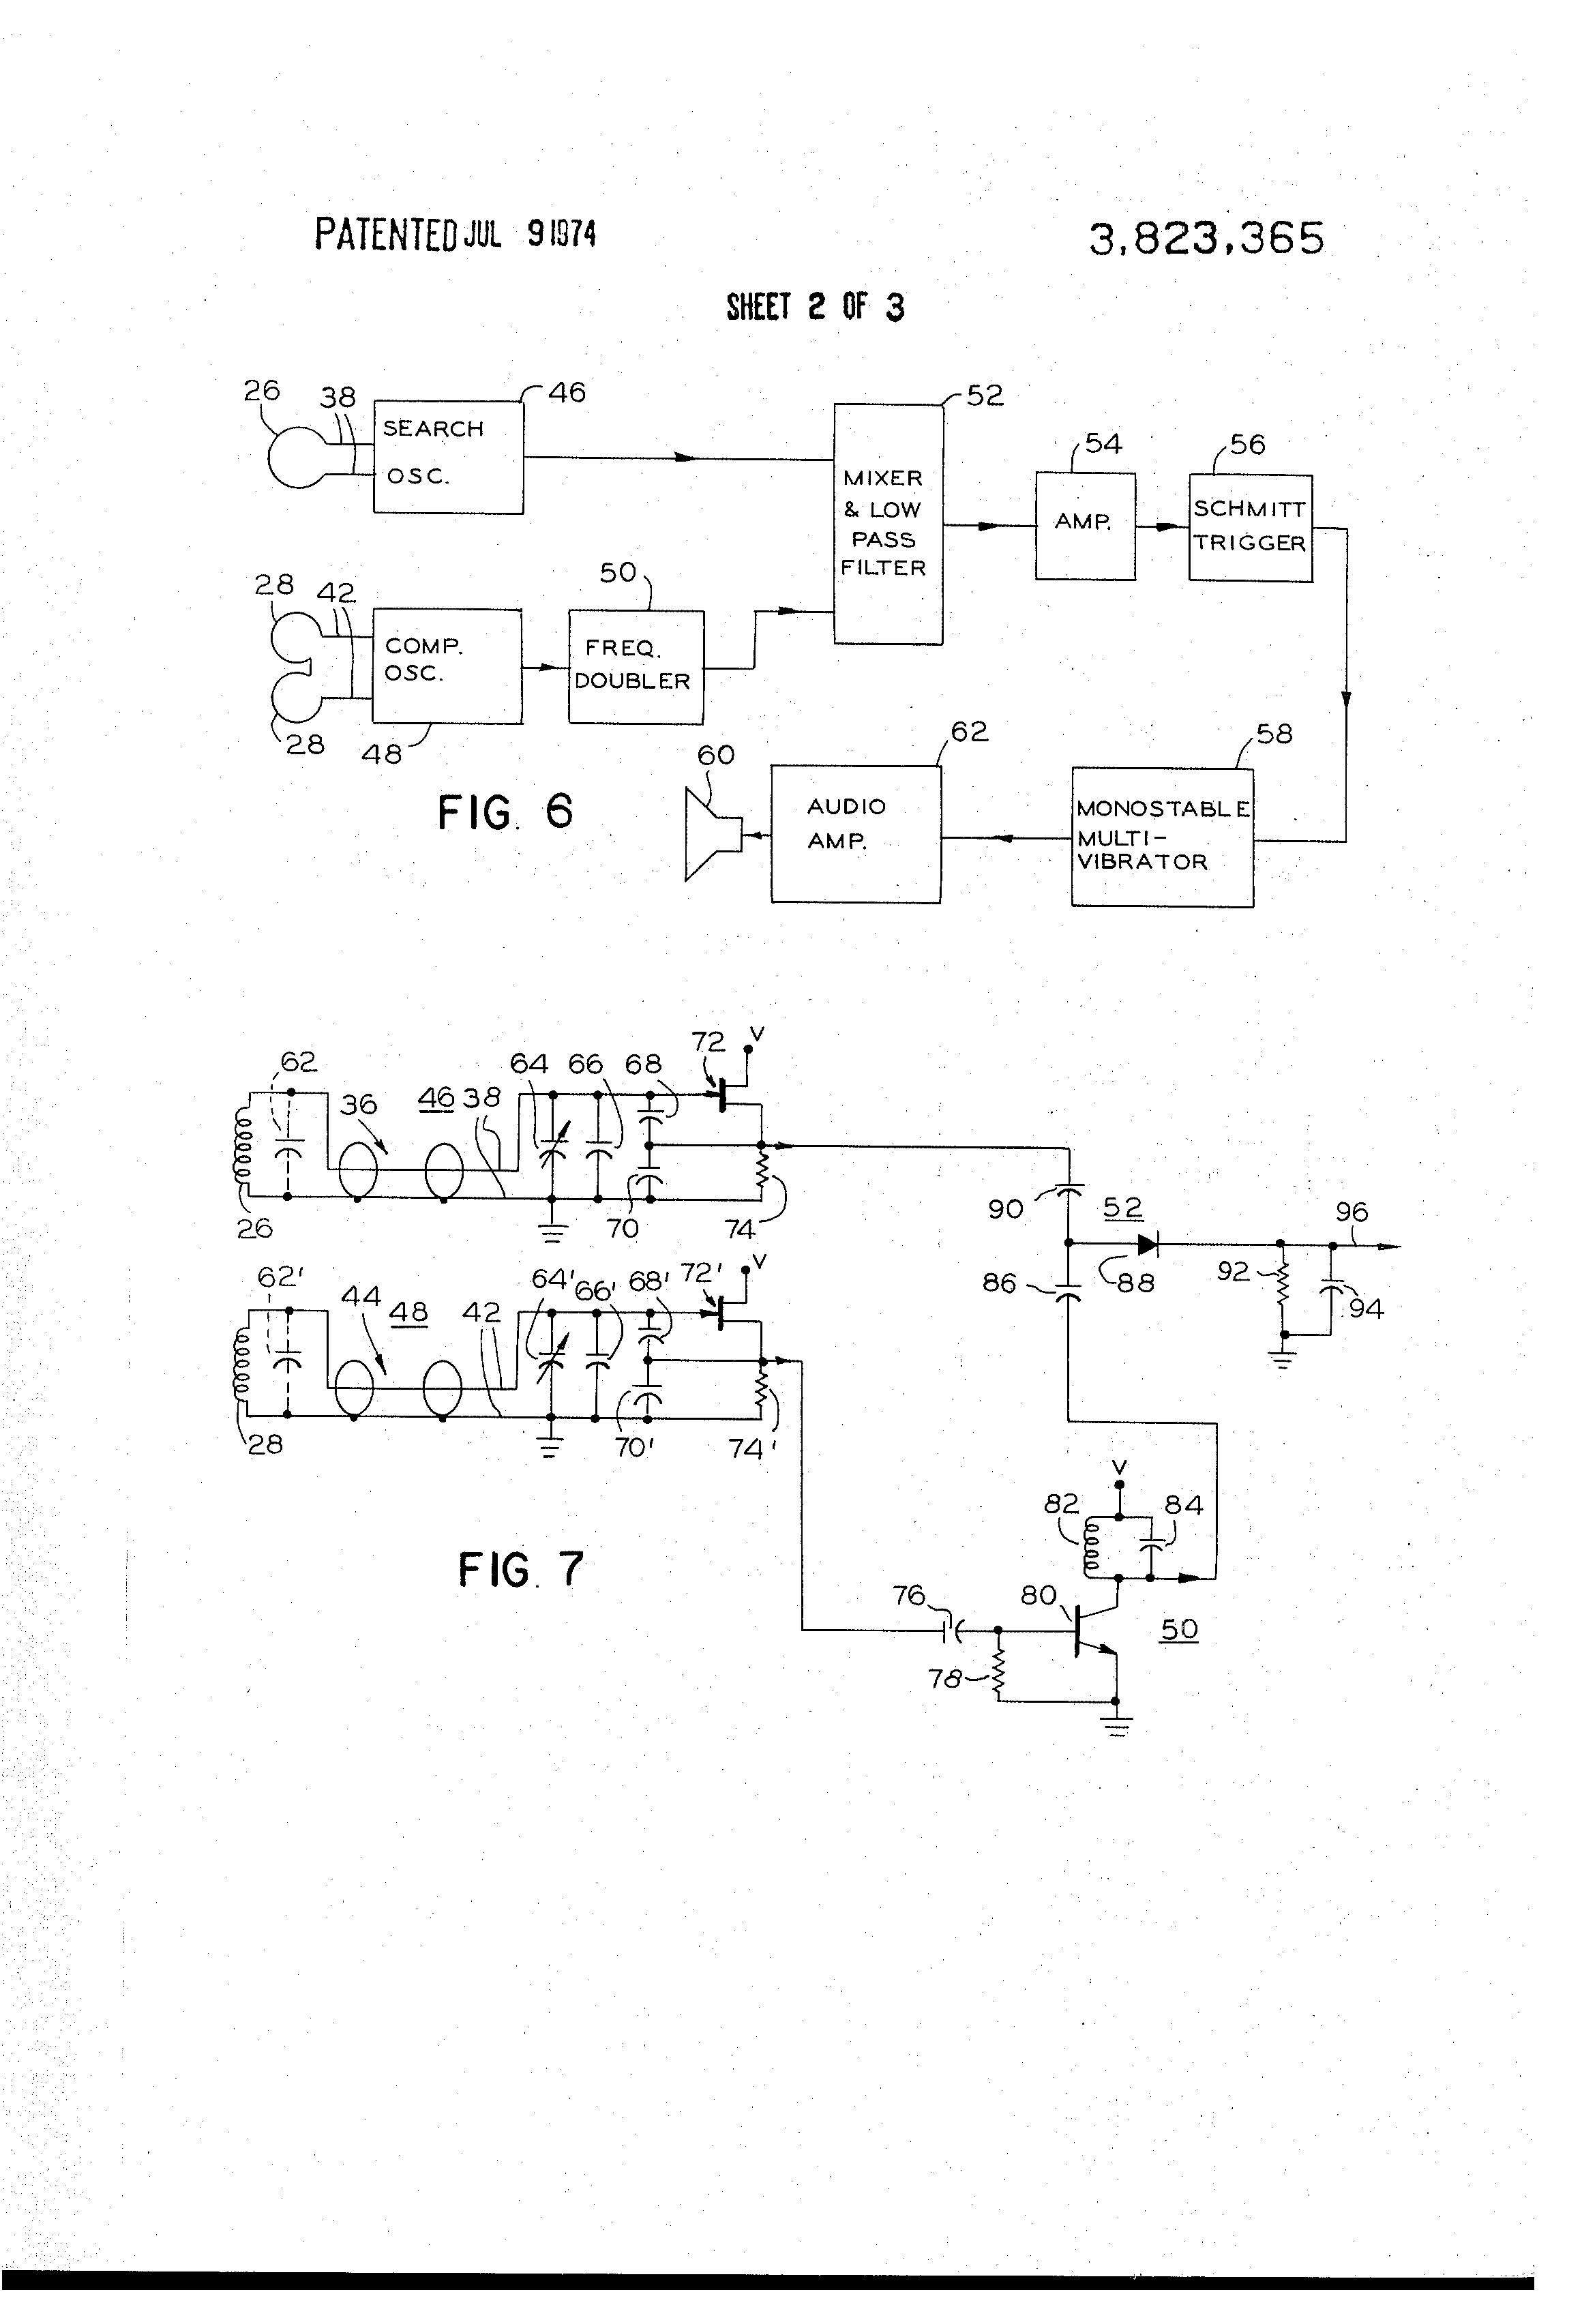 Patent Us3823365 Metal Detecting Apparatus Having Improved Ground Bfo Detectors Circuit Diagram Electronic Circuits Drawing